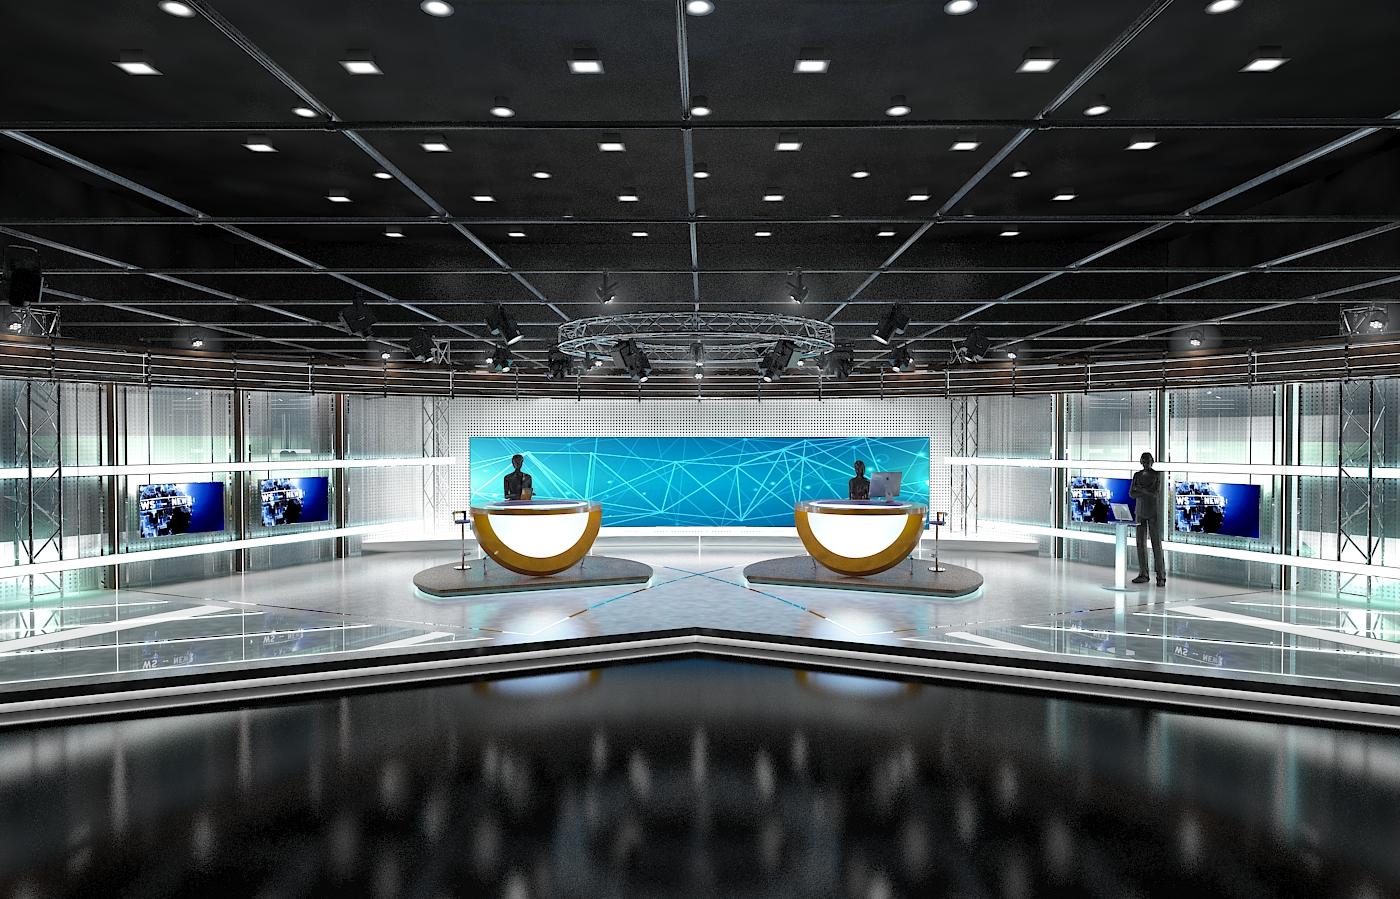 виртуал телевизийн студи цуглуулга vol 6 3d загвар max dxf dwg fbx obj 223393